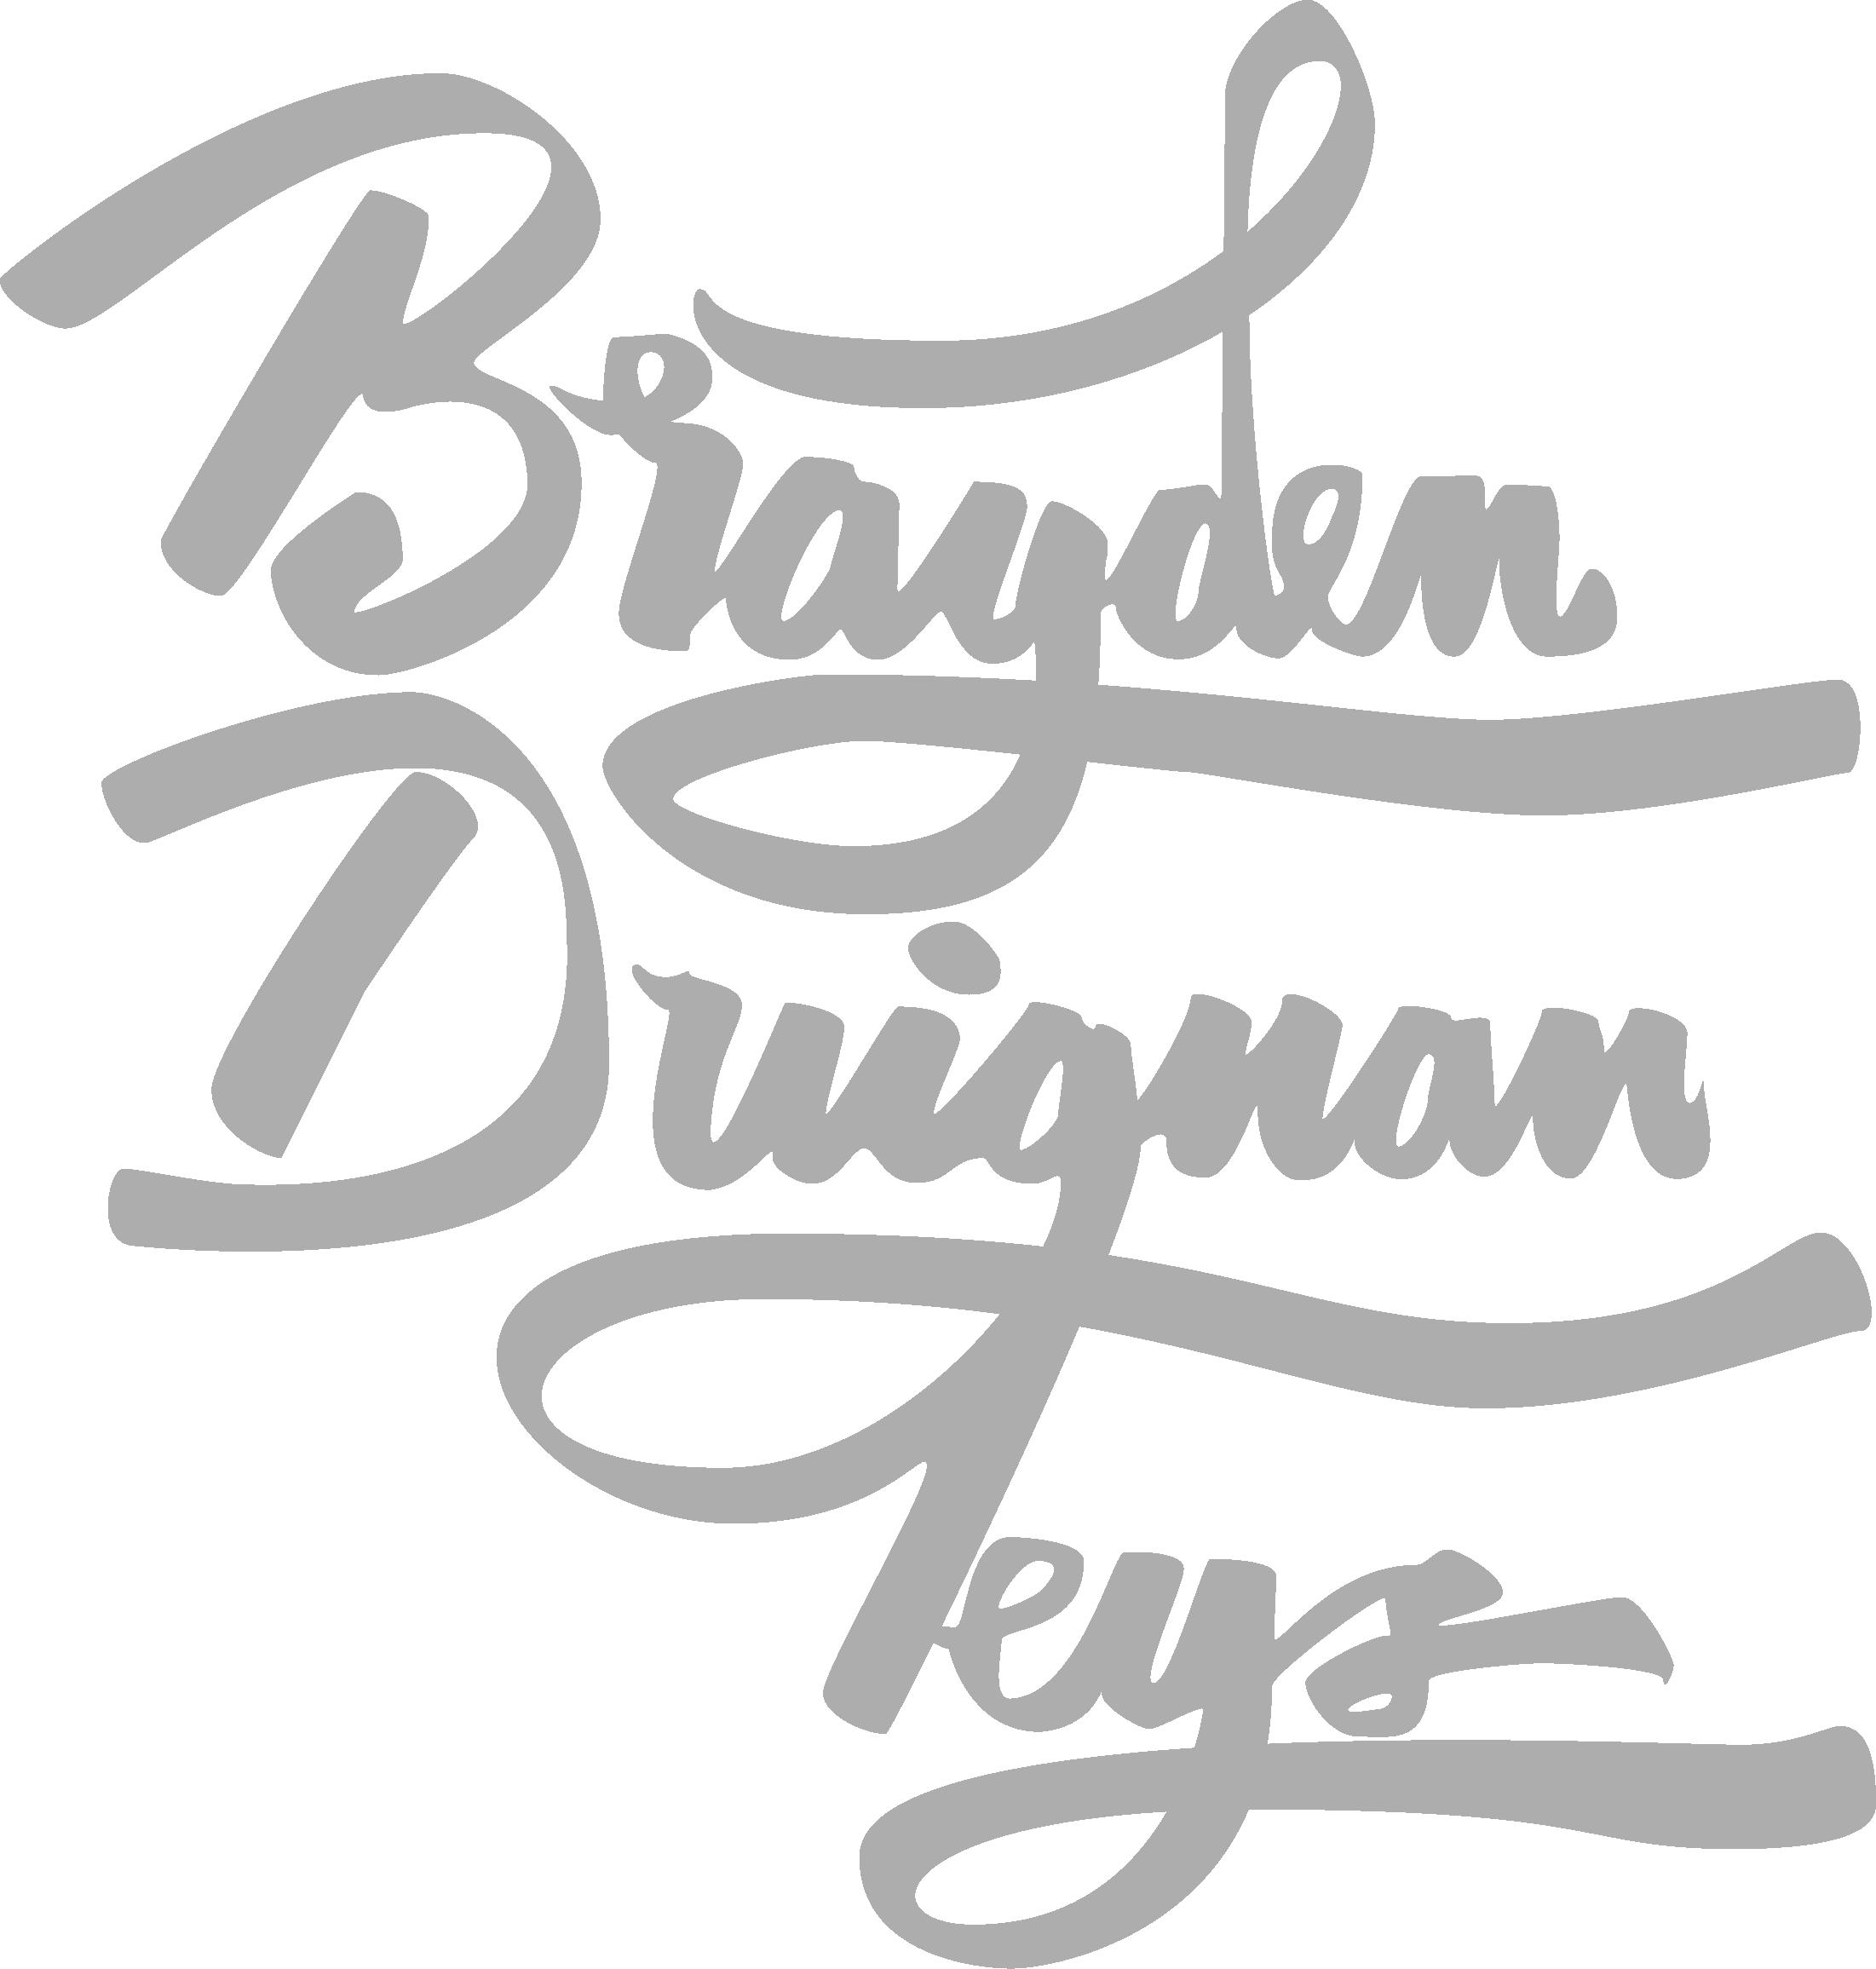 Brayden Duignan-Teys